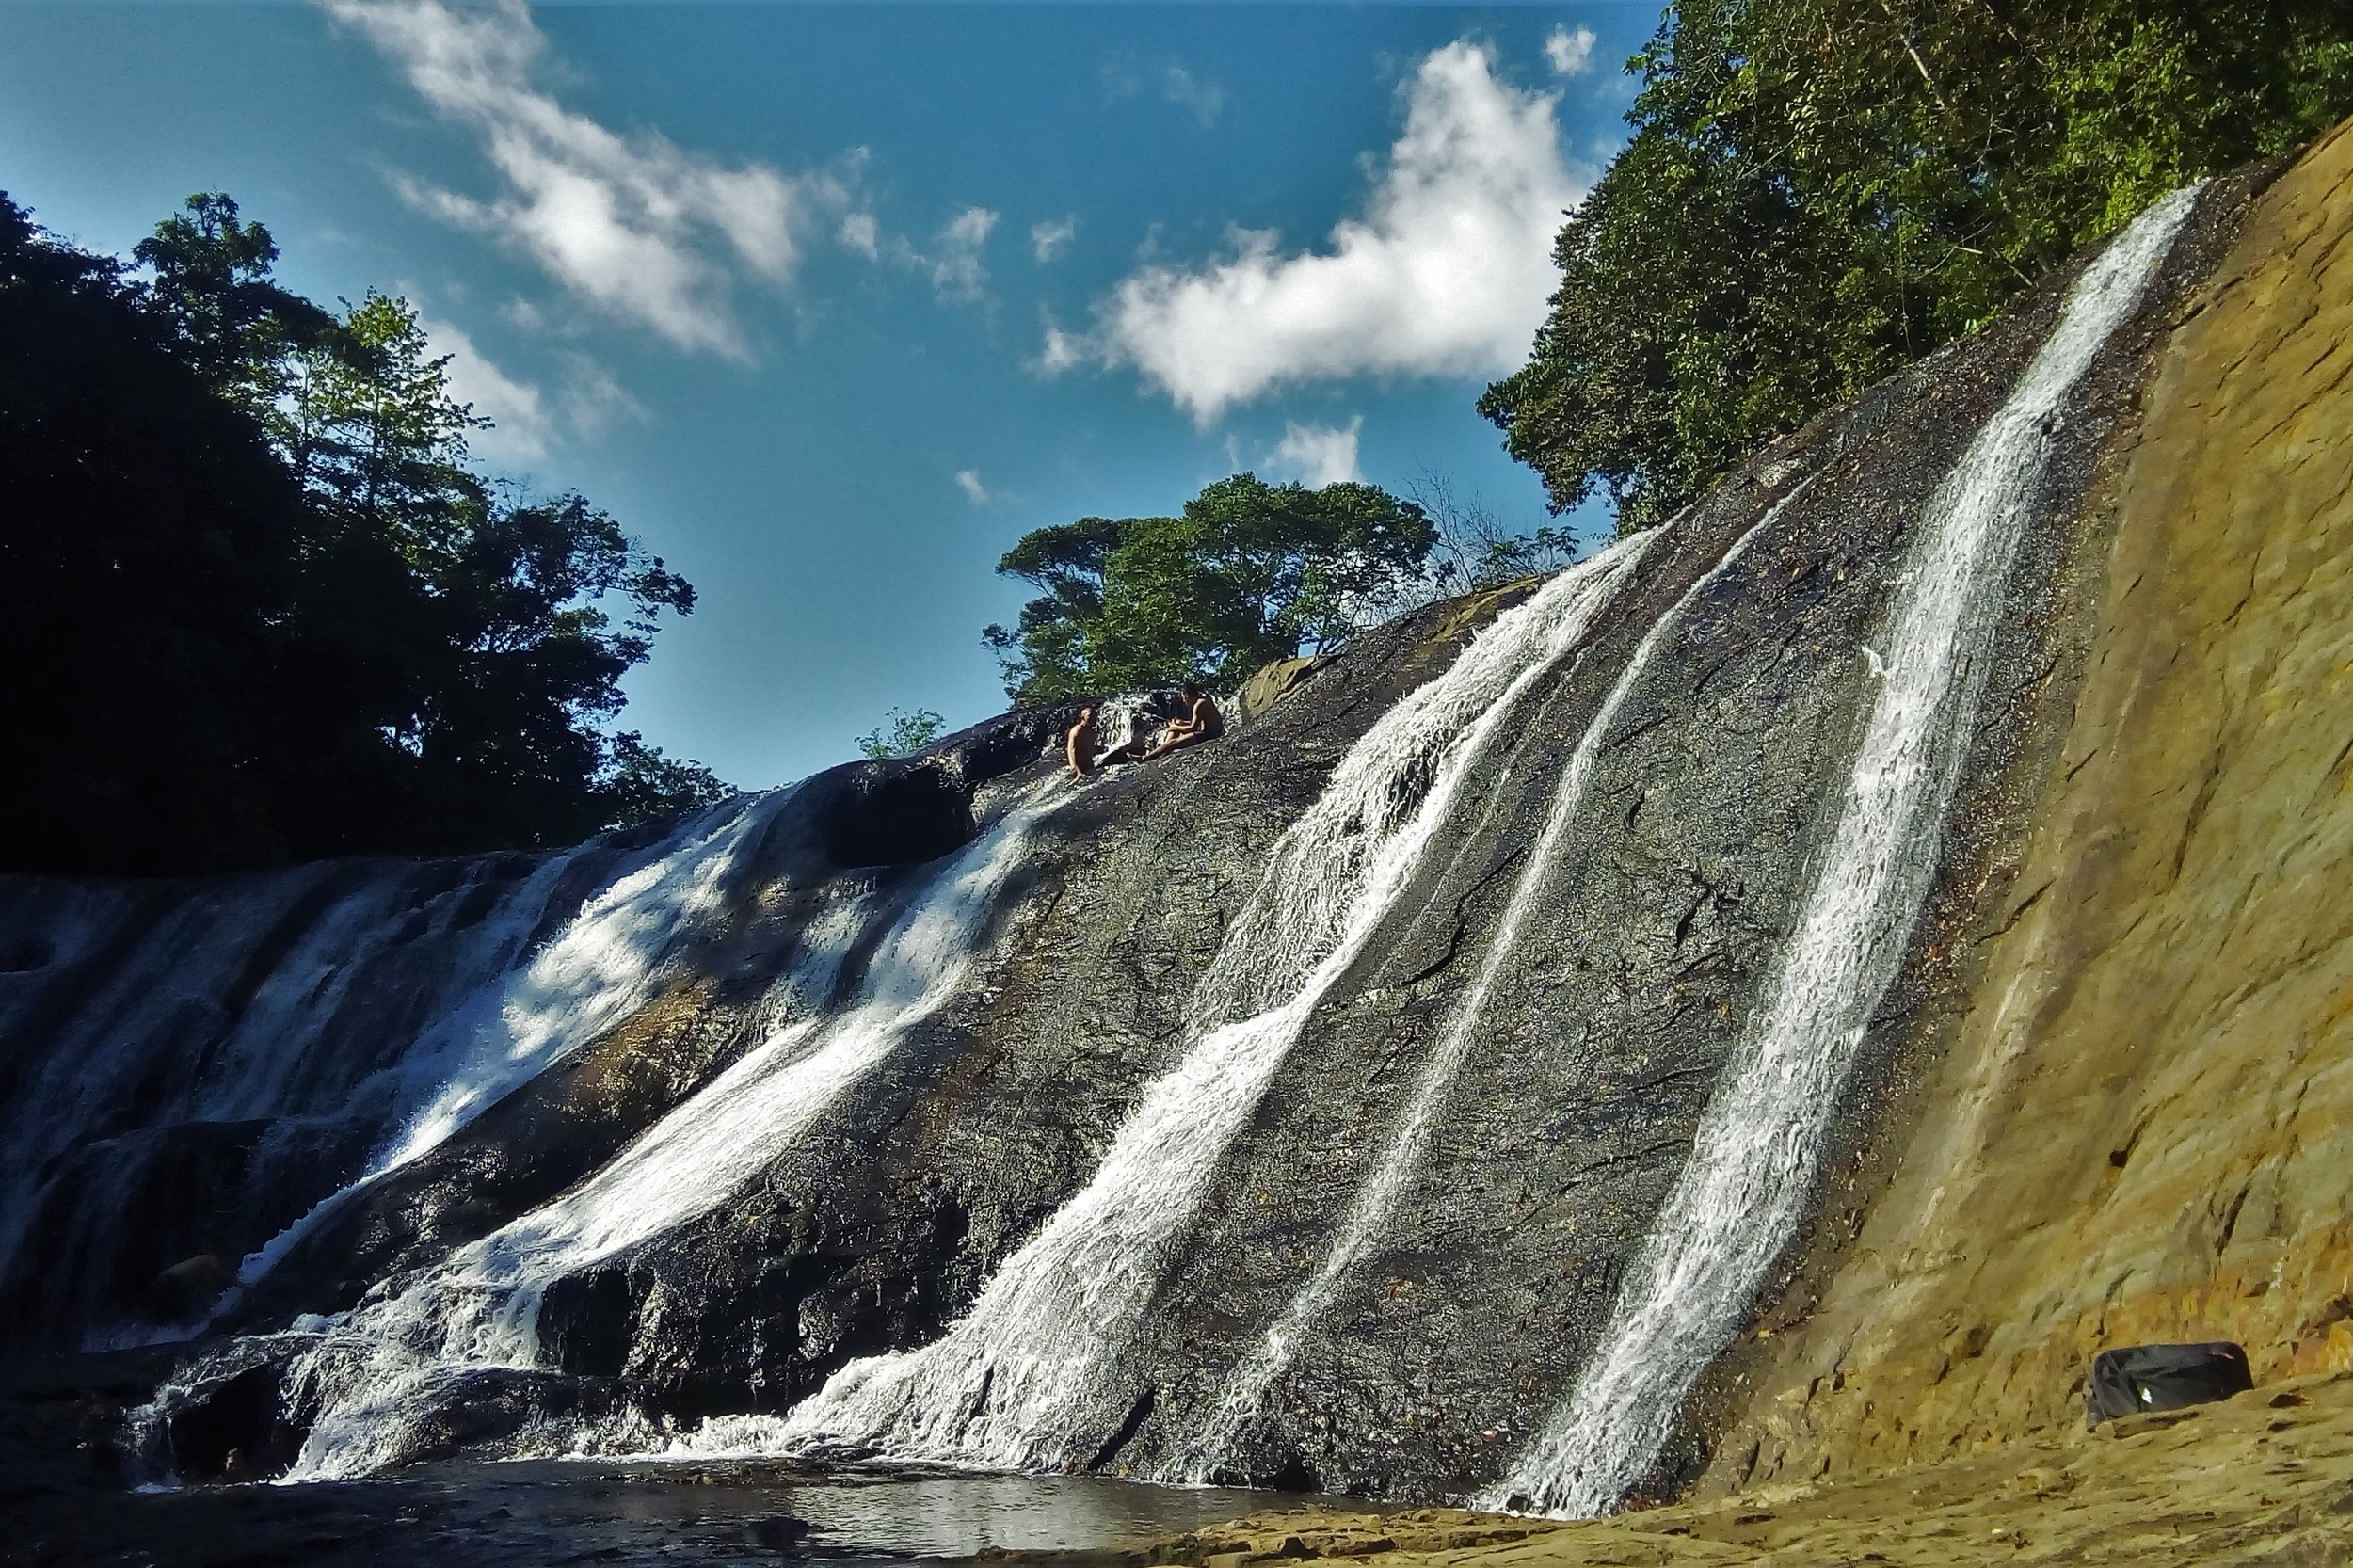 La Margarita Waterfalls - Pérez Zeledón